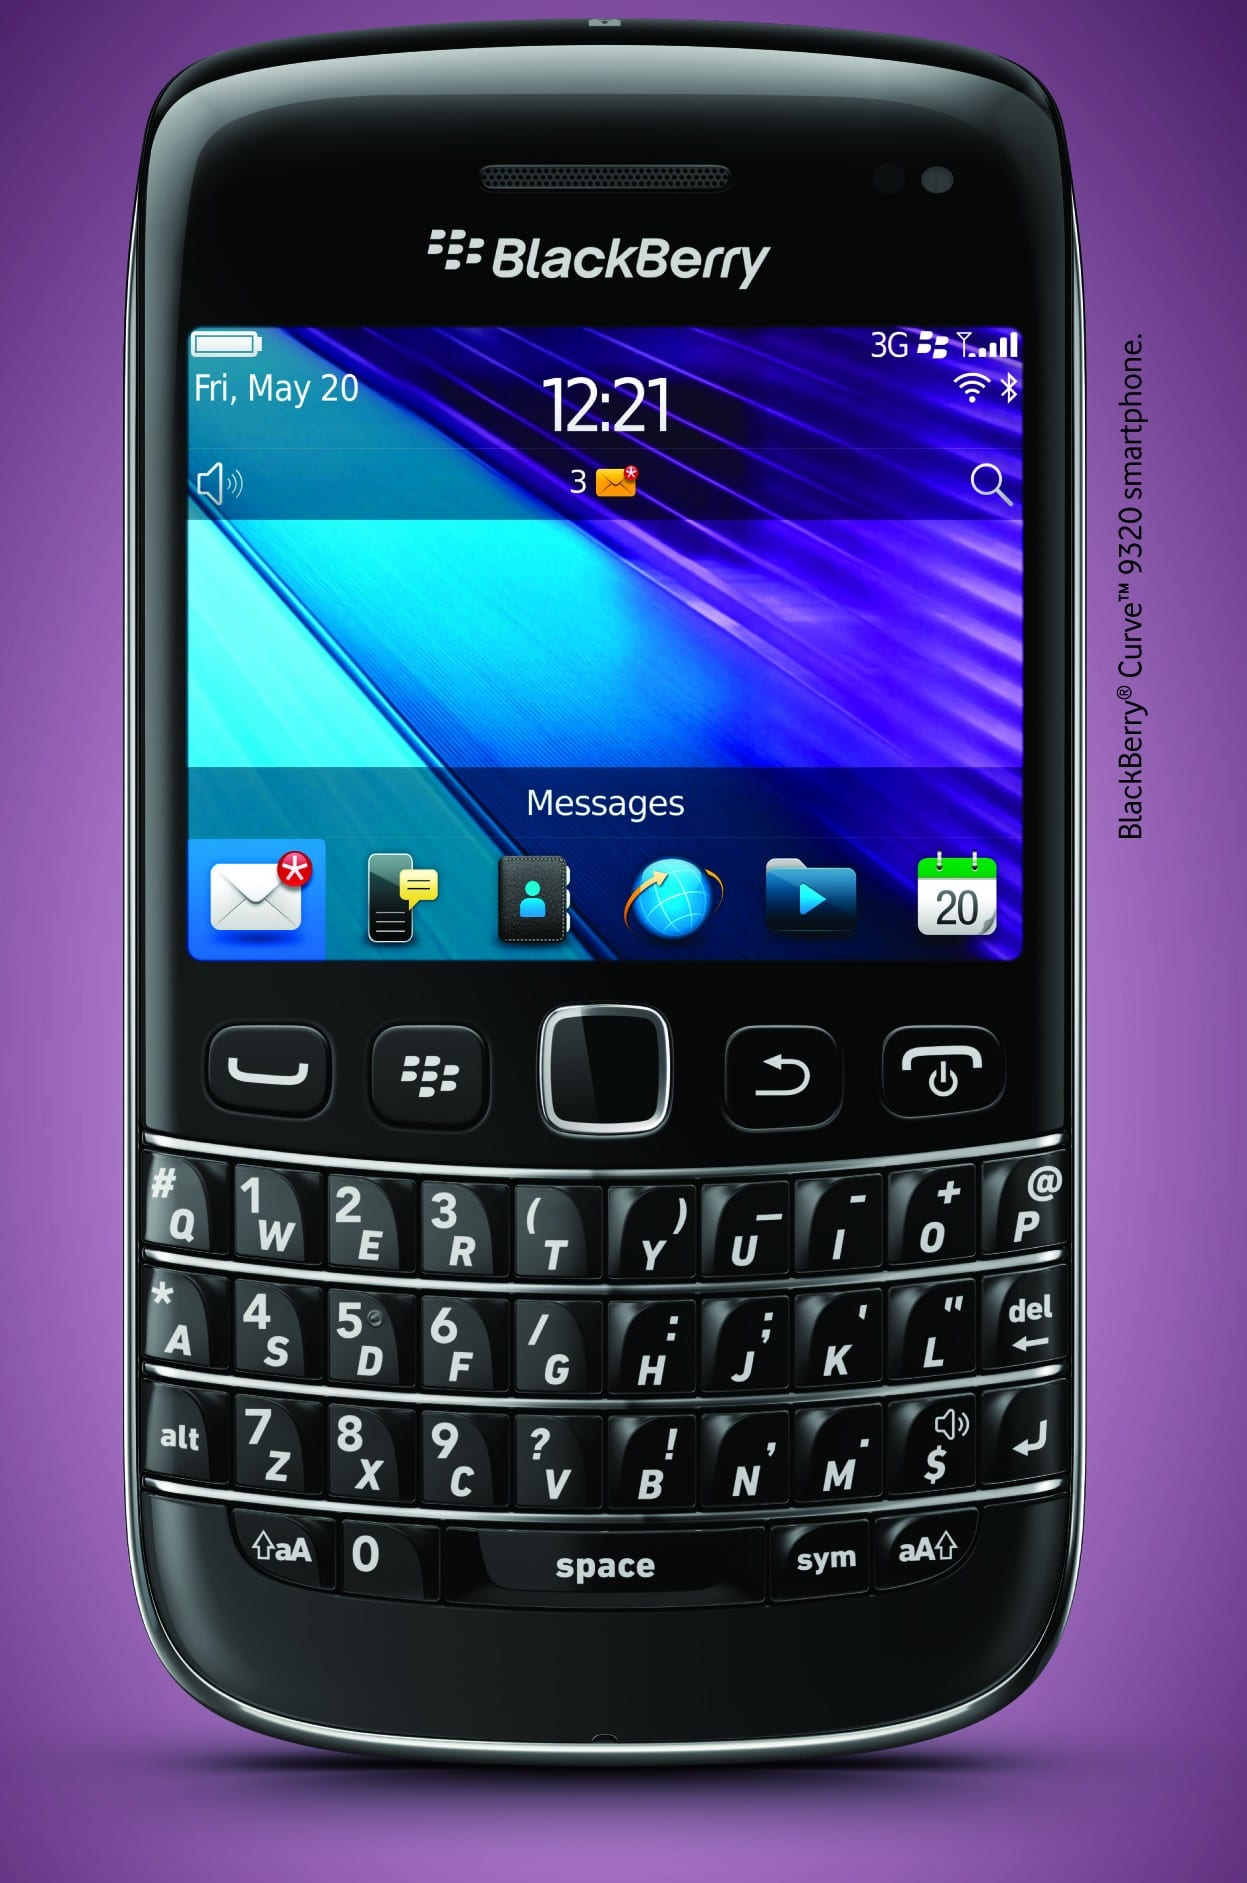 85 - VF Blackberry 9320 Poster (PR)-14 image